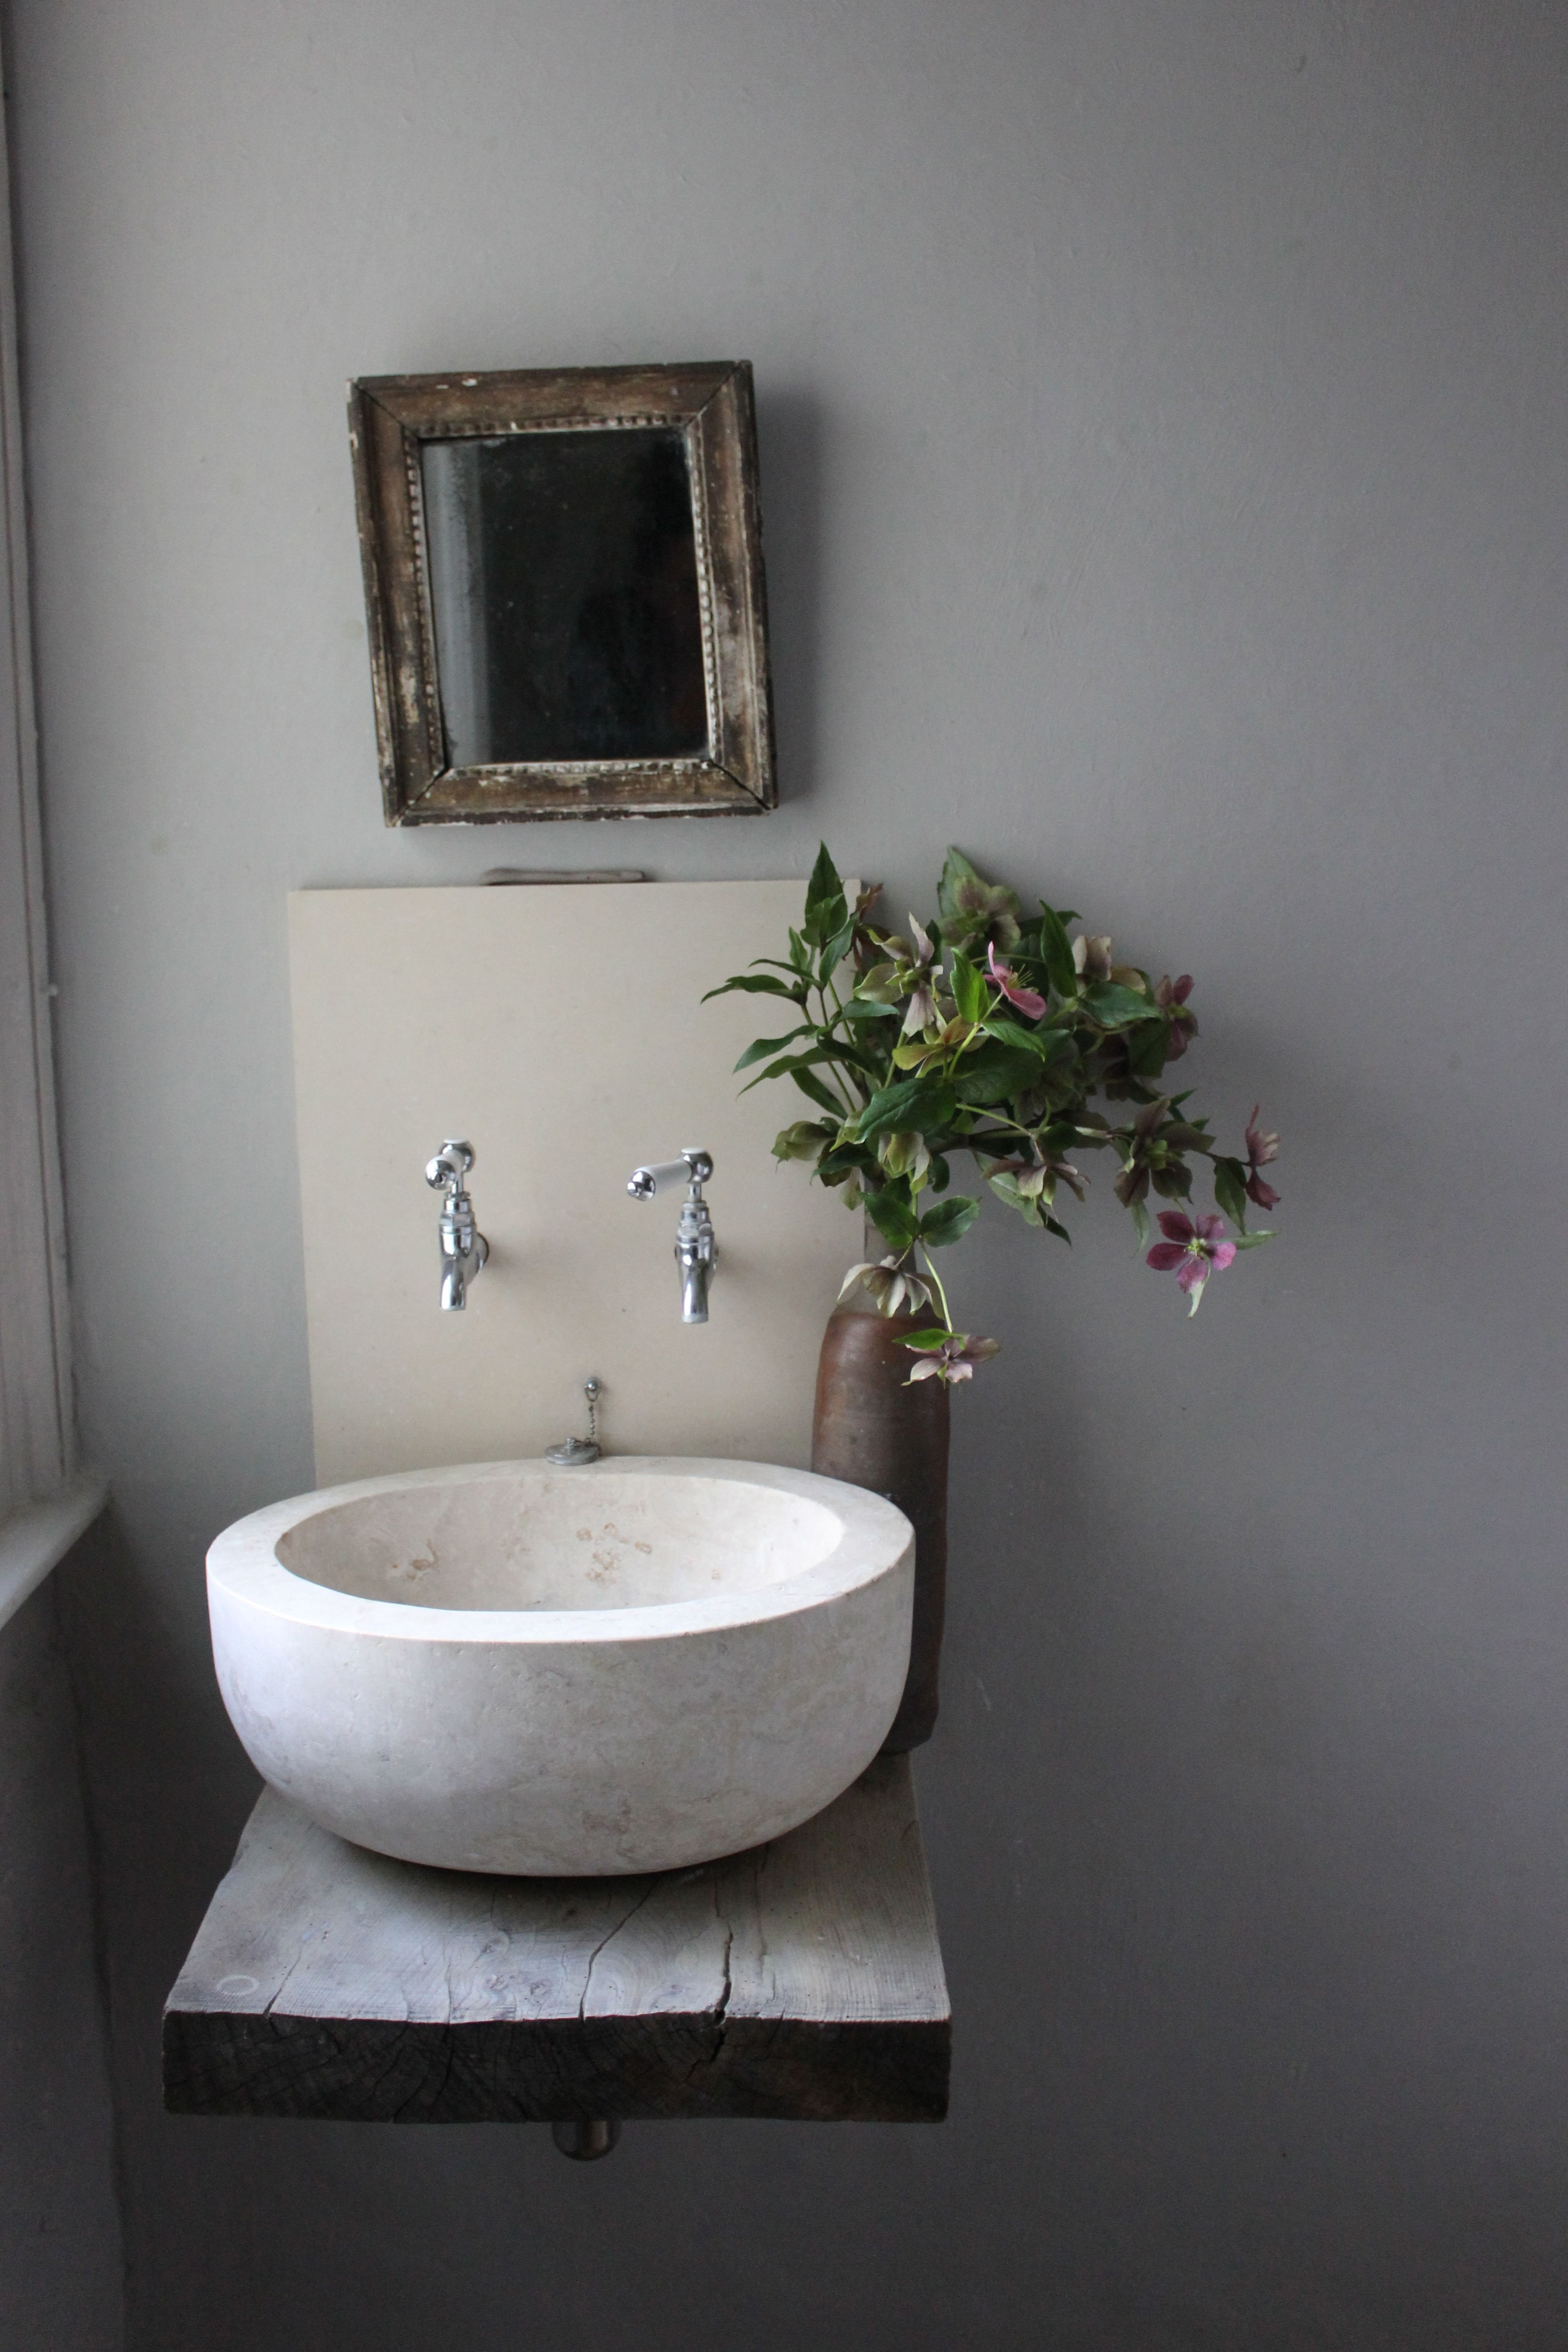 Modern Bathroom Sinks to Accentuate Small Bathroom Design | Sinks ...